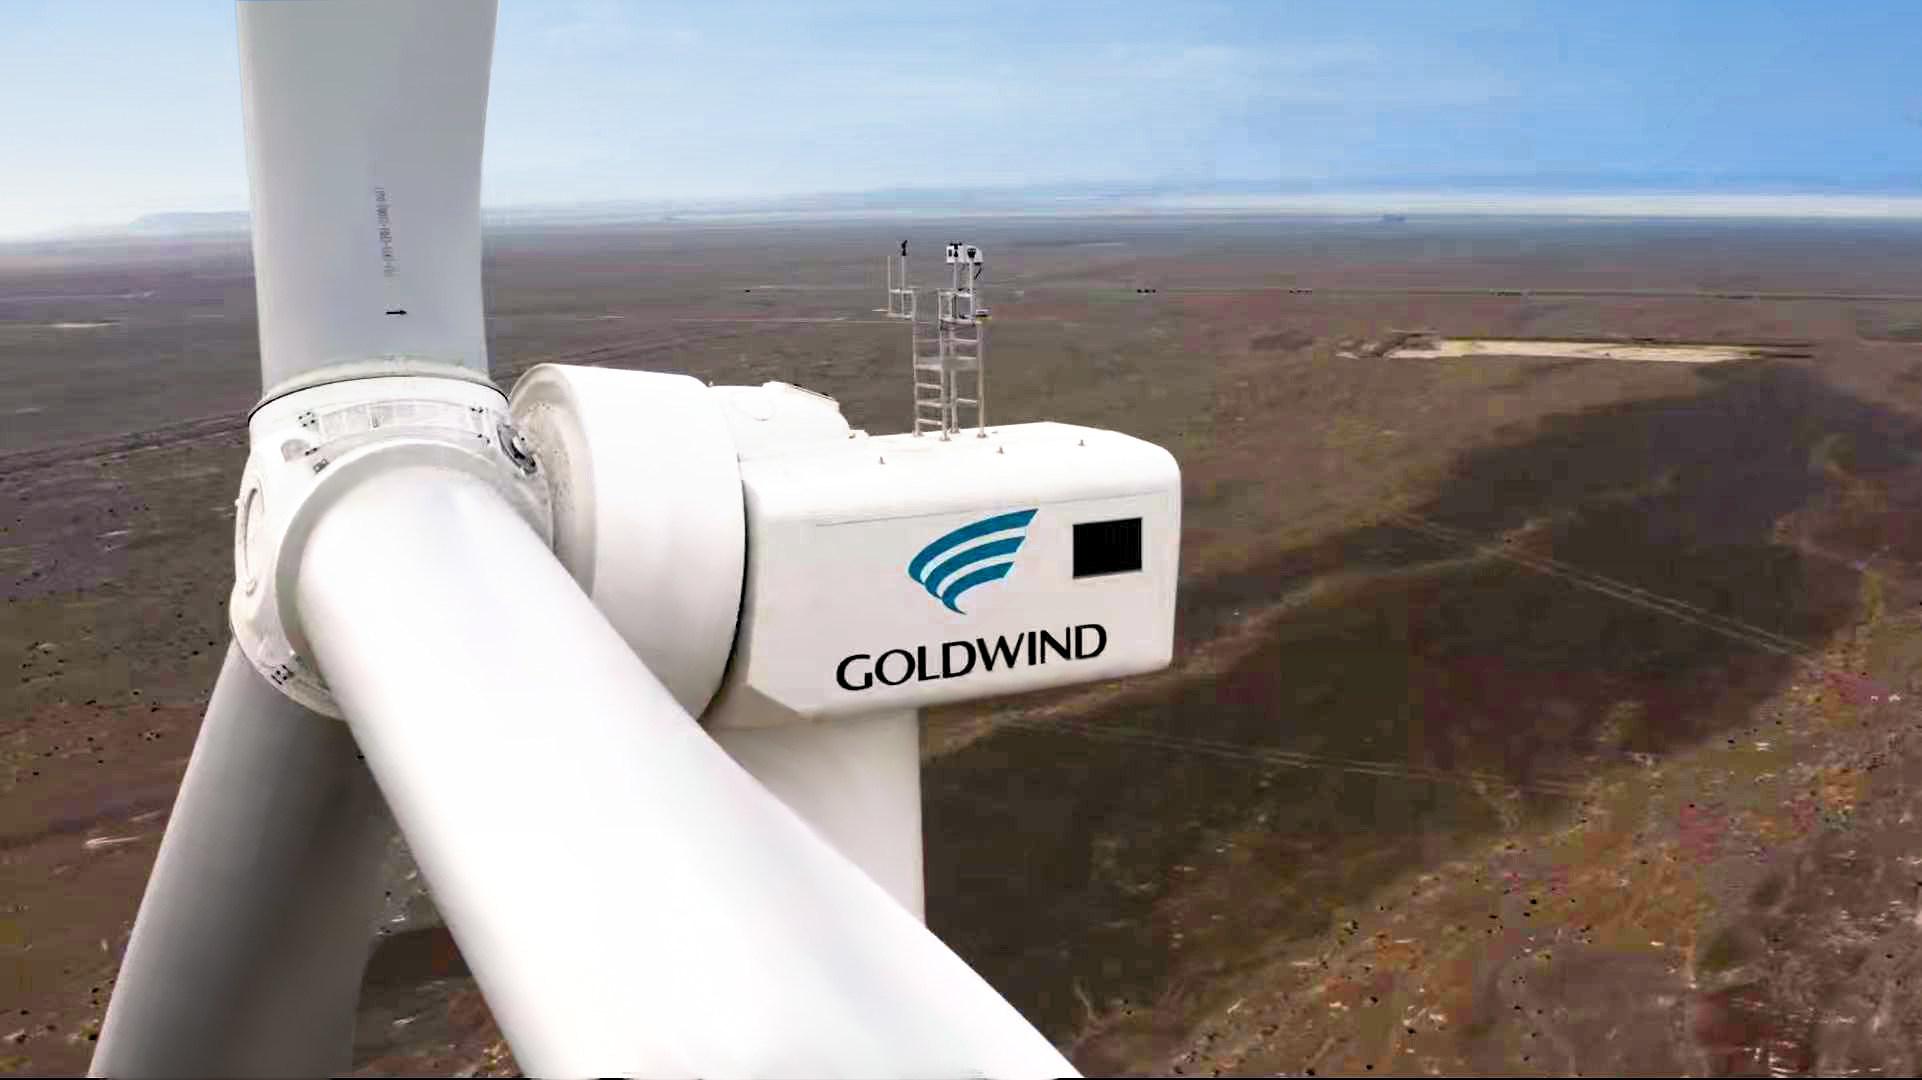 Goldwind's 5-Megawatt Plus Onshore Test Turbine Marks Grid Connection Milestone